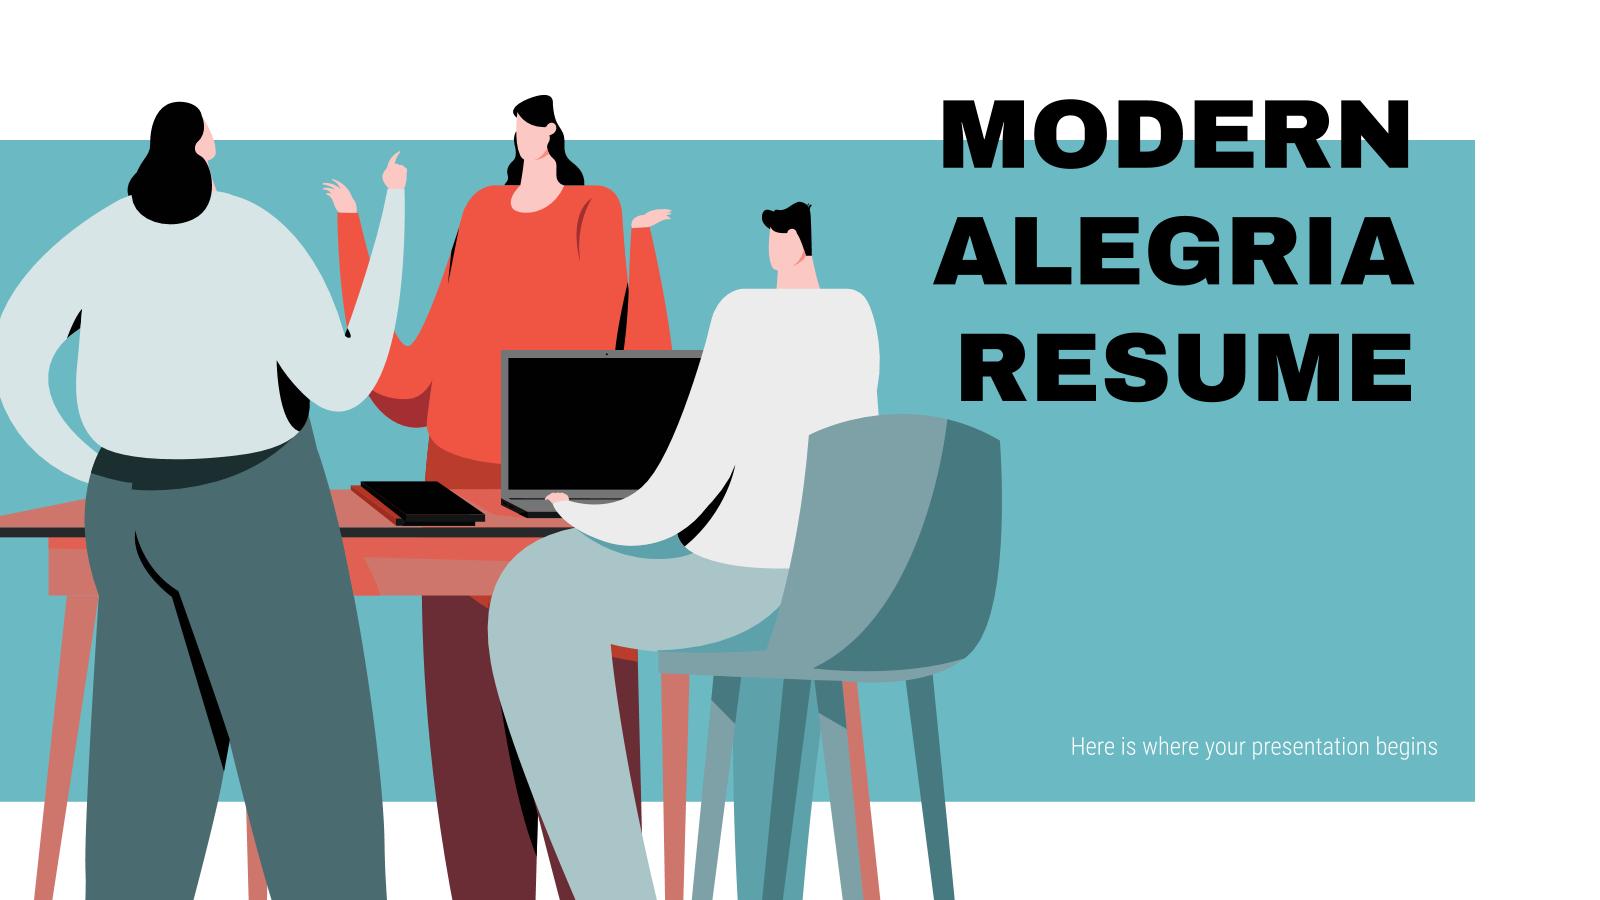 Modern Alegria Resume presentation template